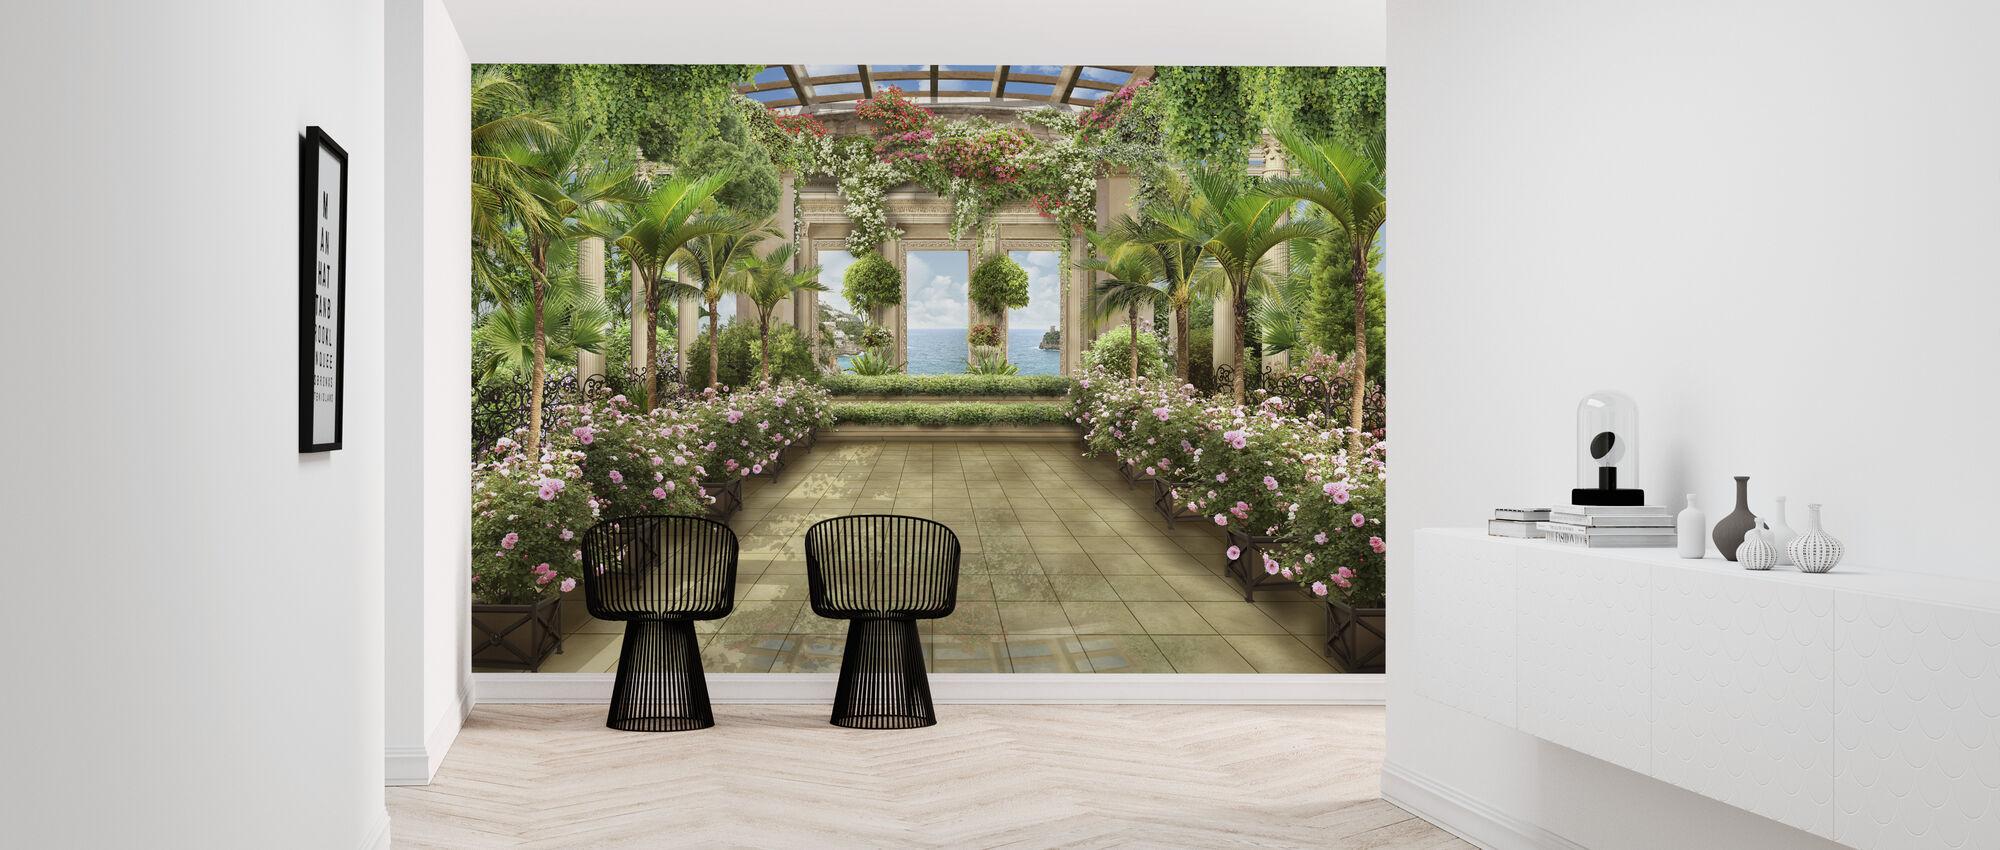 Greenhouse - Wallpaper - Hallway